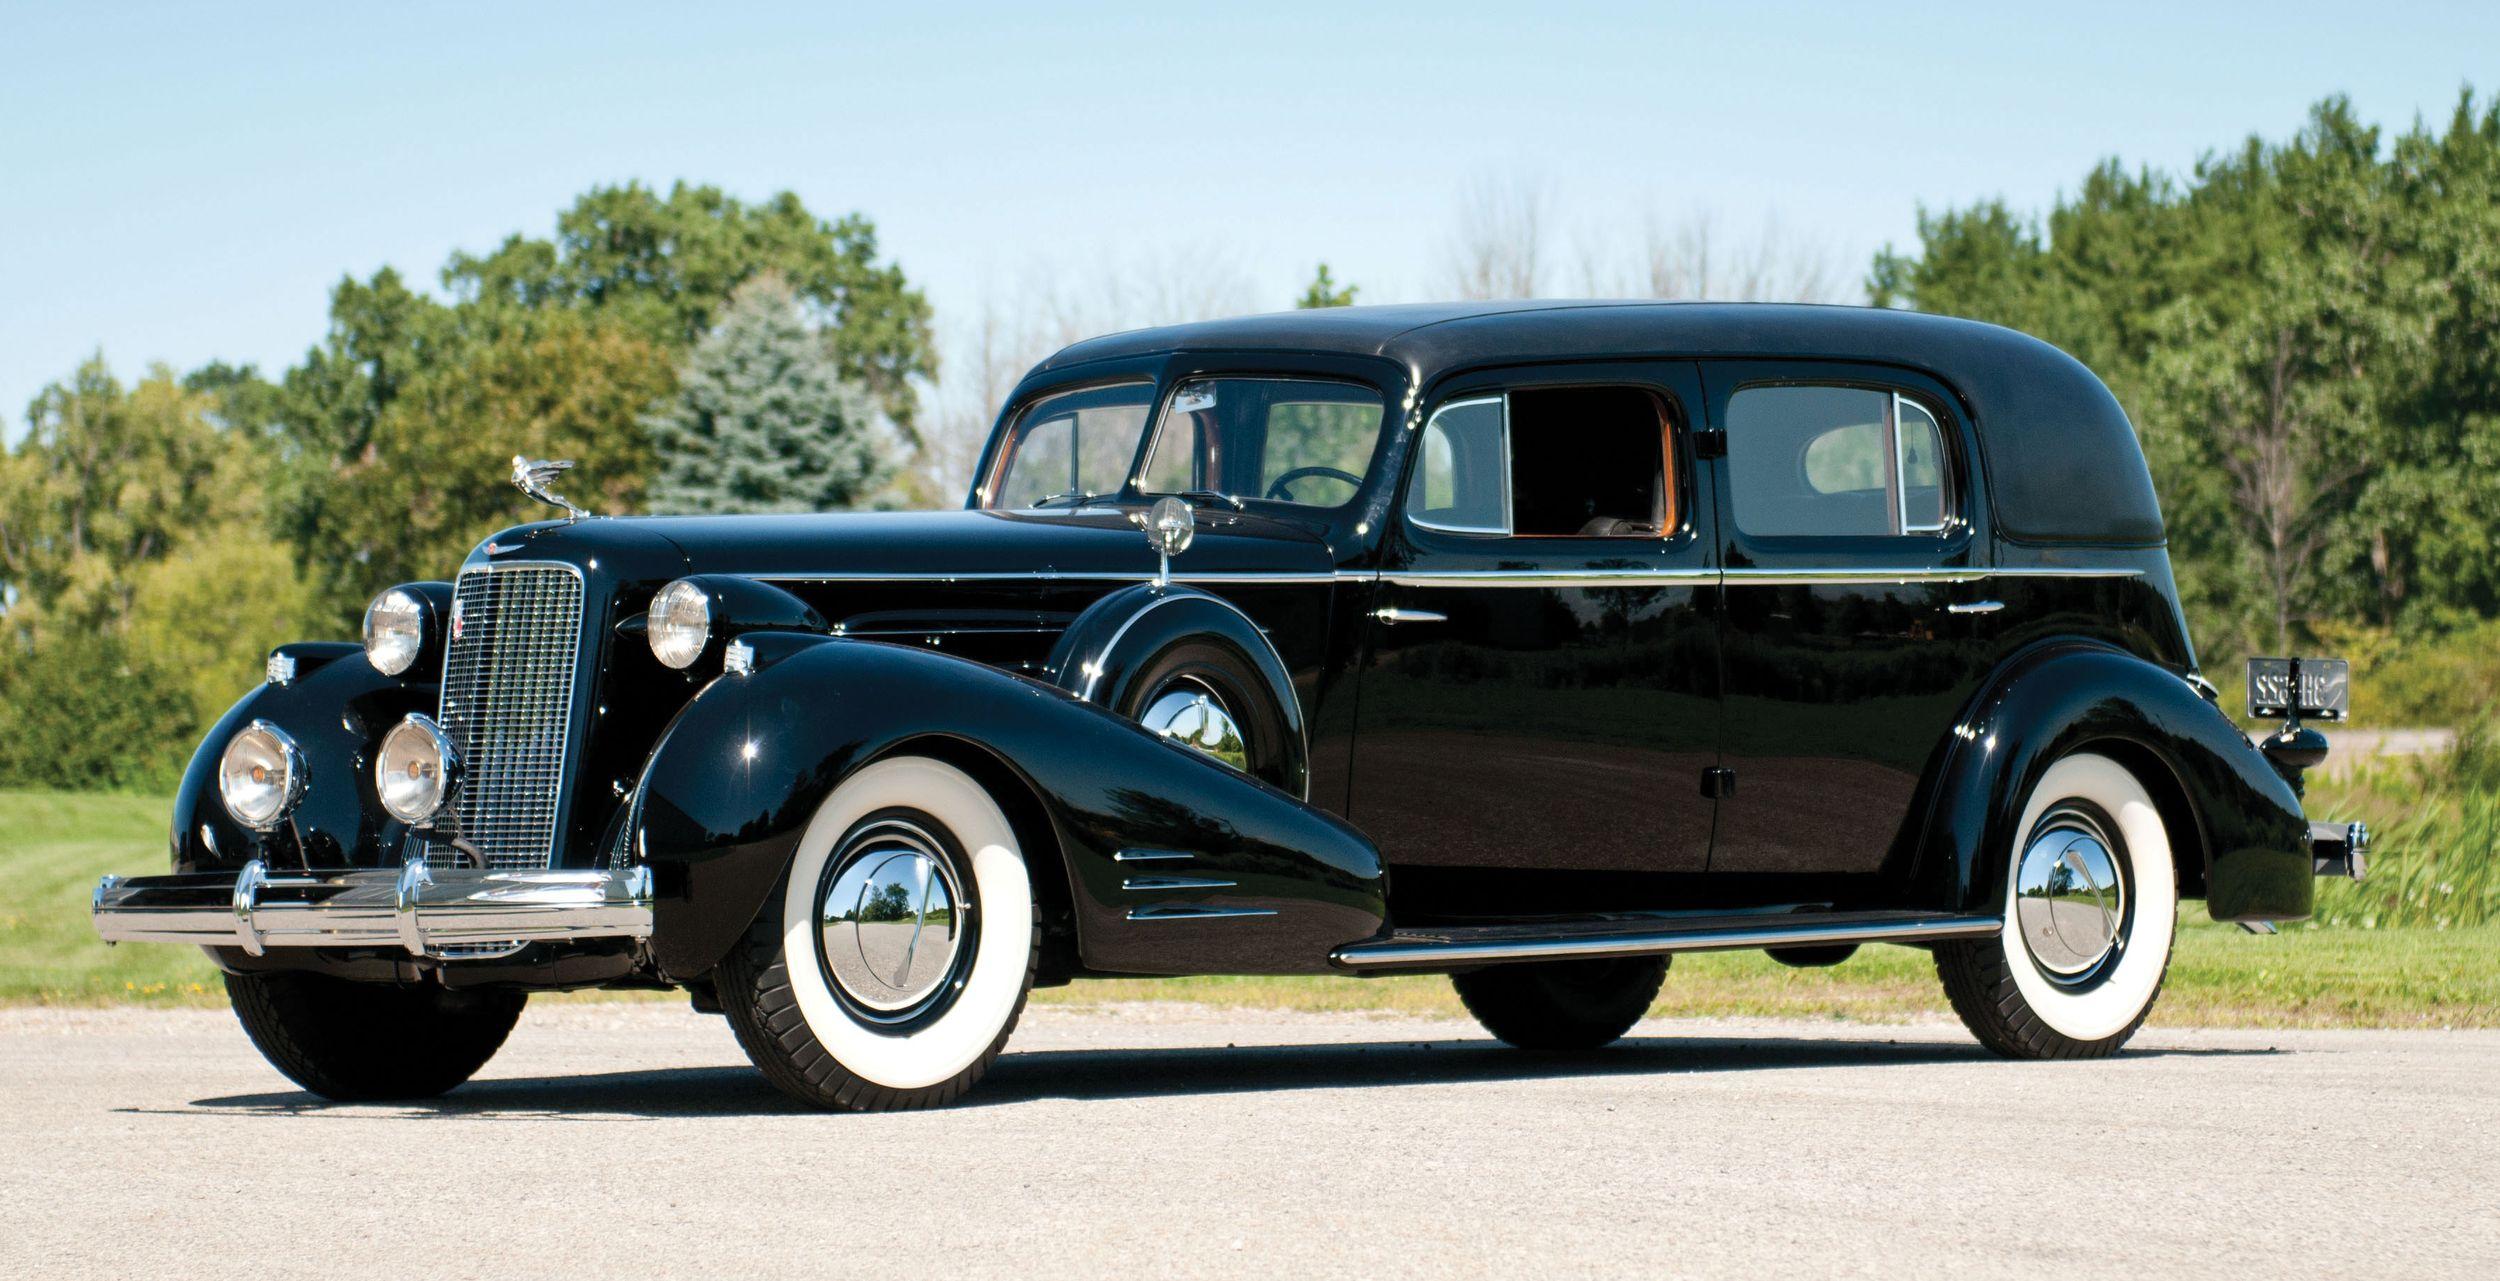 1937-Cadillac-V-16-Custom-Imperial-courtesy-Auctions-America.jpg